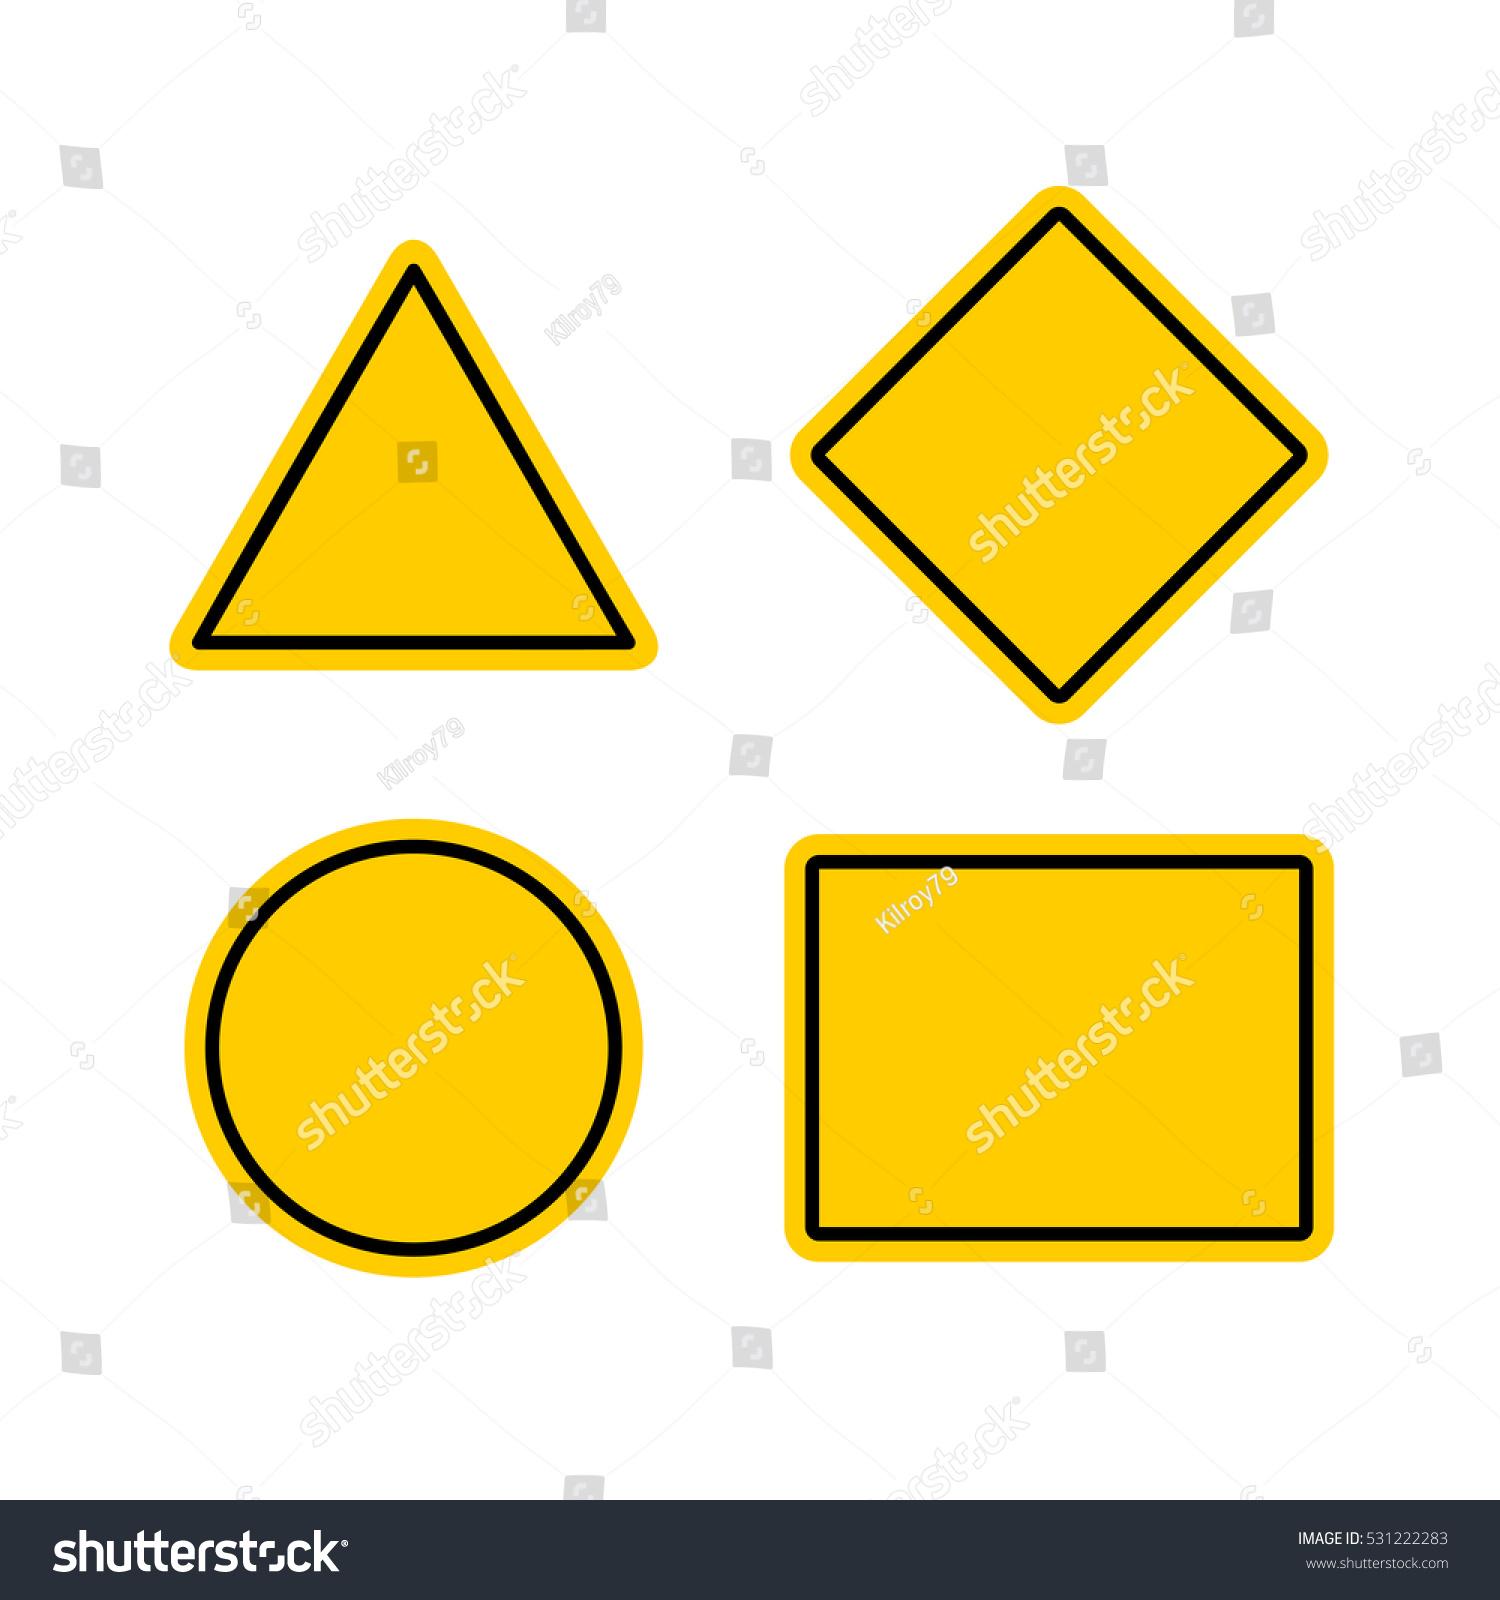 sign templates